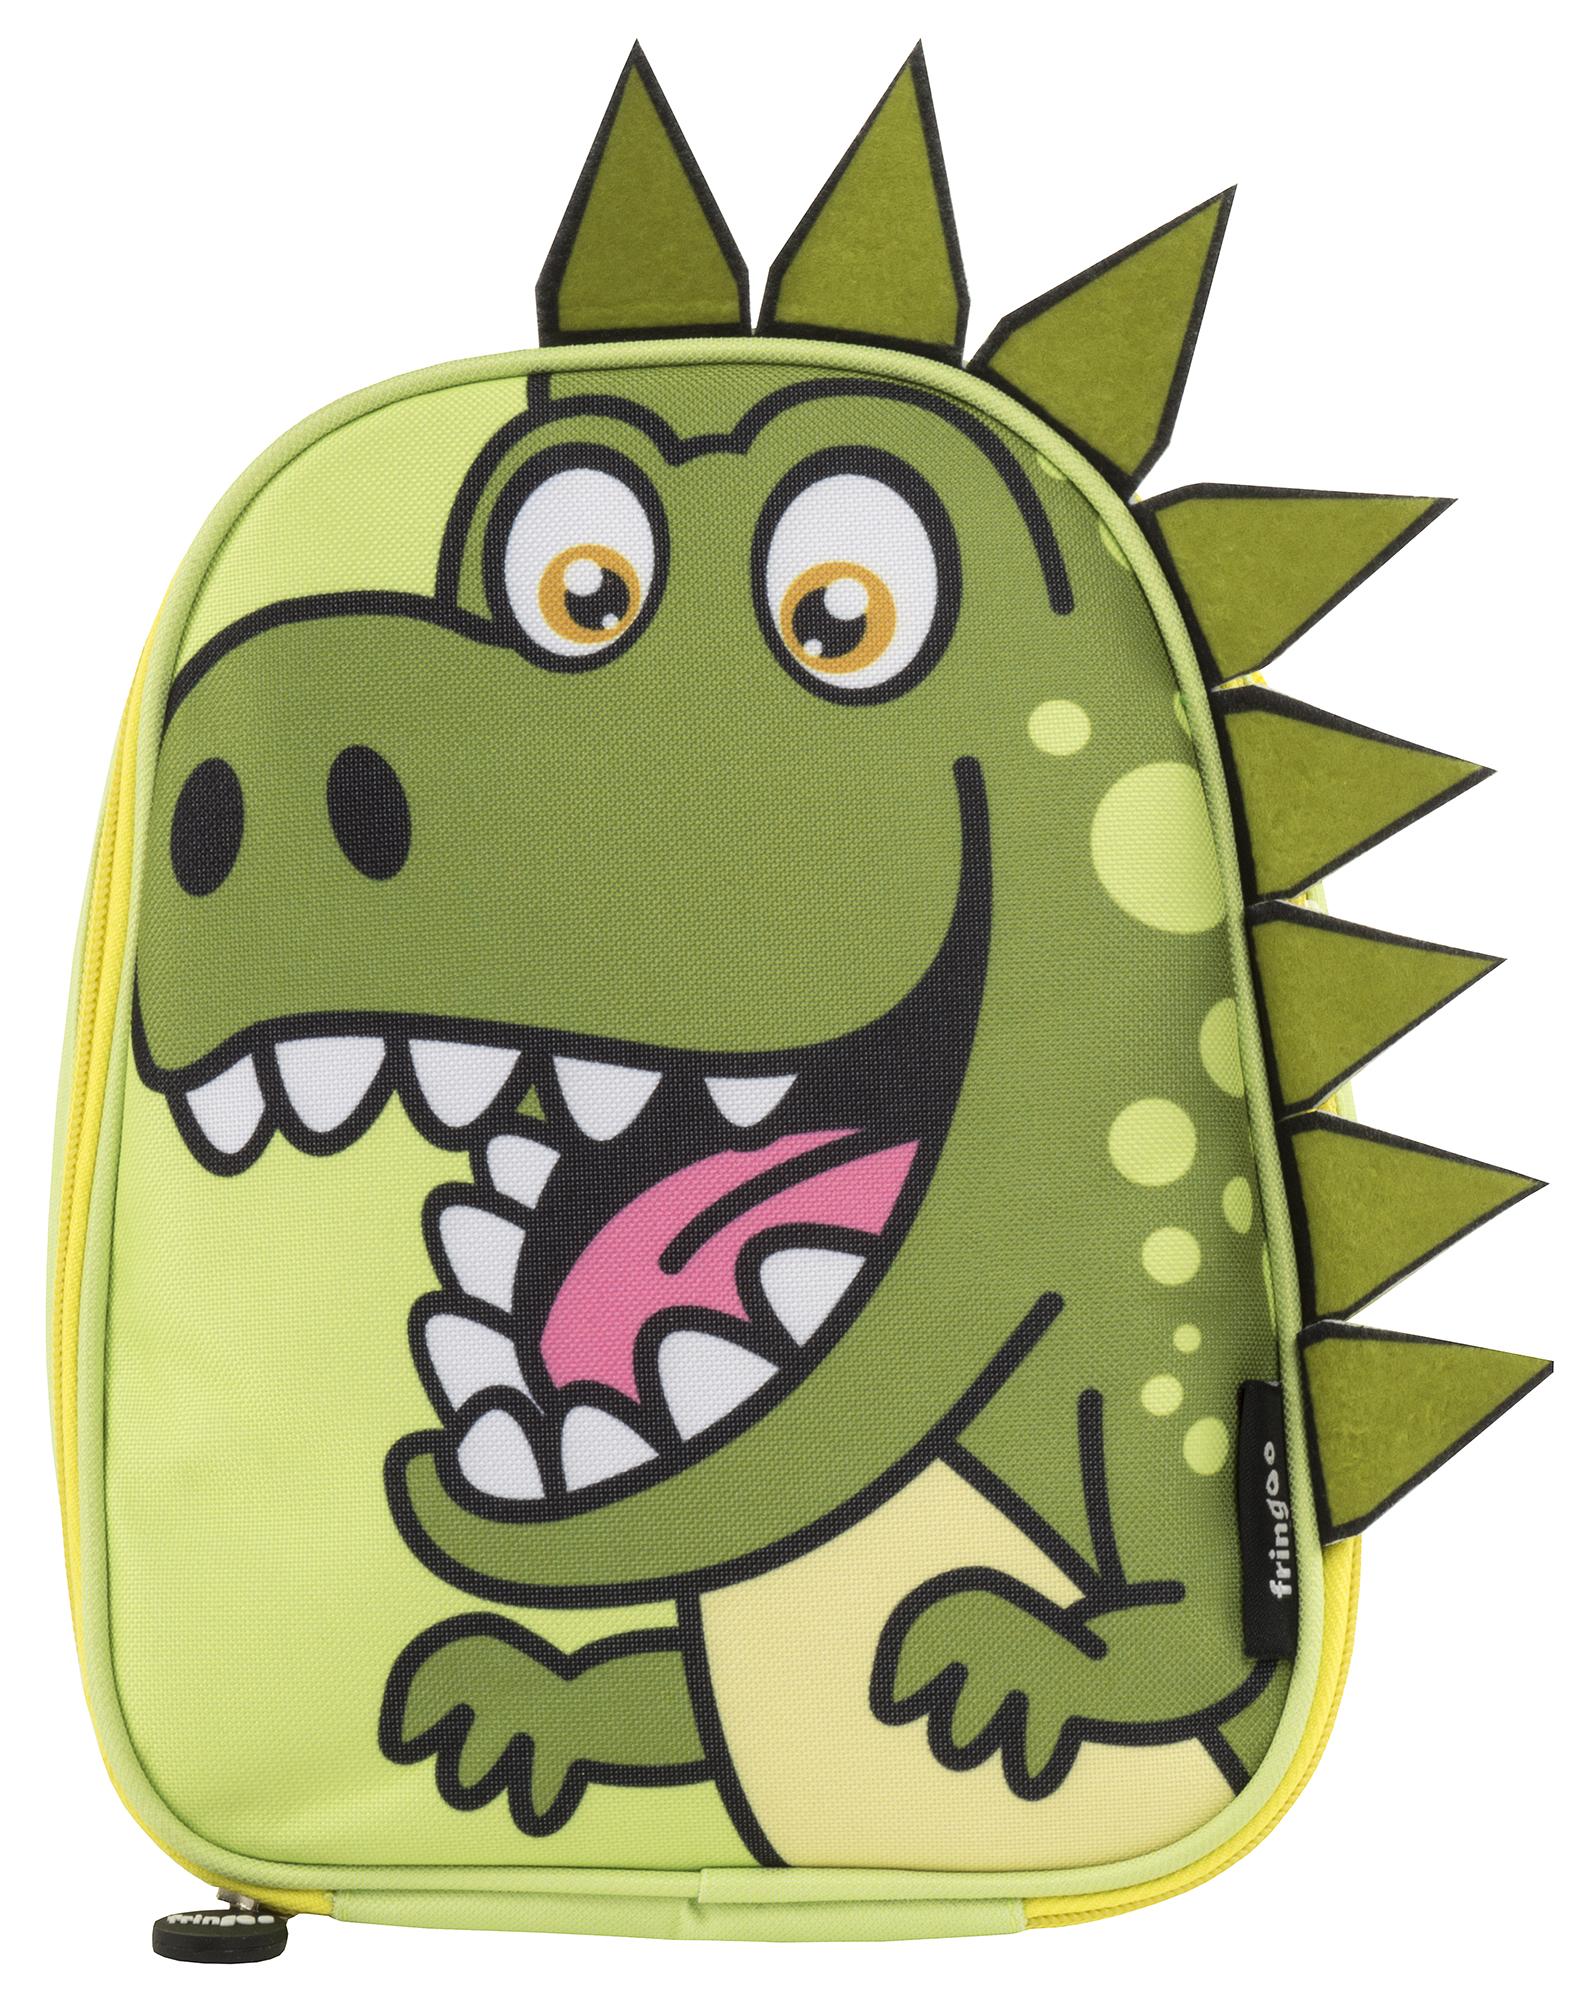 254ad3bca2d2 Fringoo 3D Lunch Bag - Dino